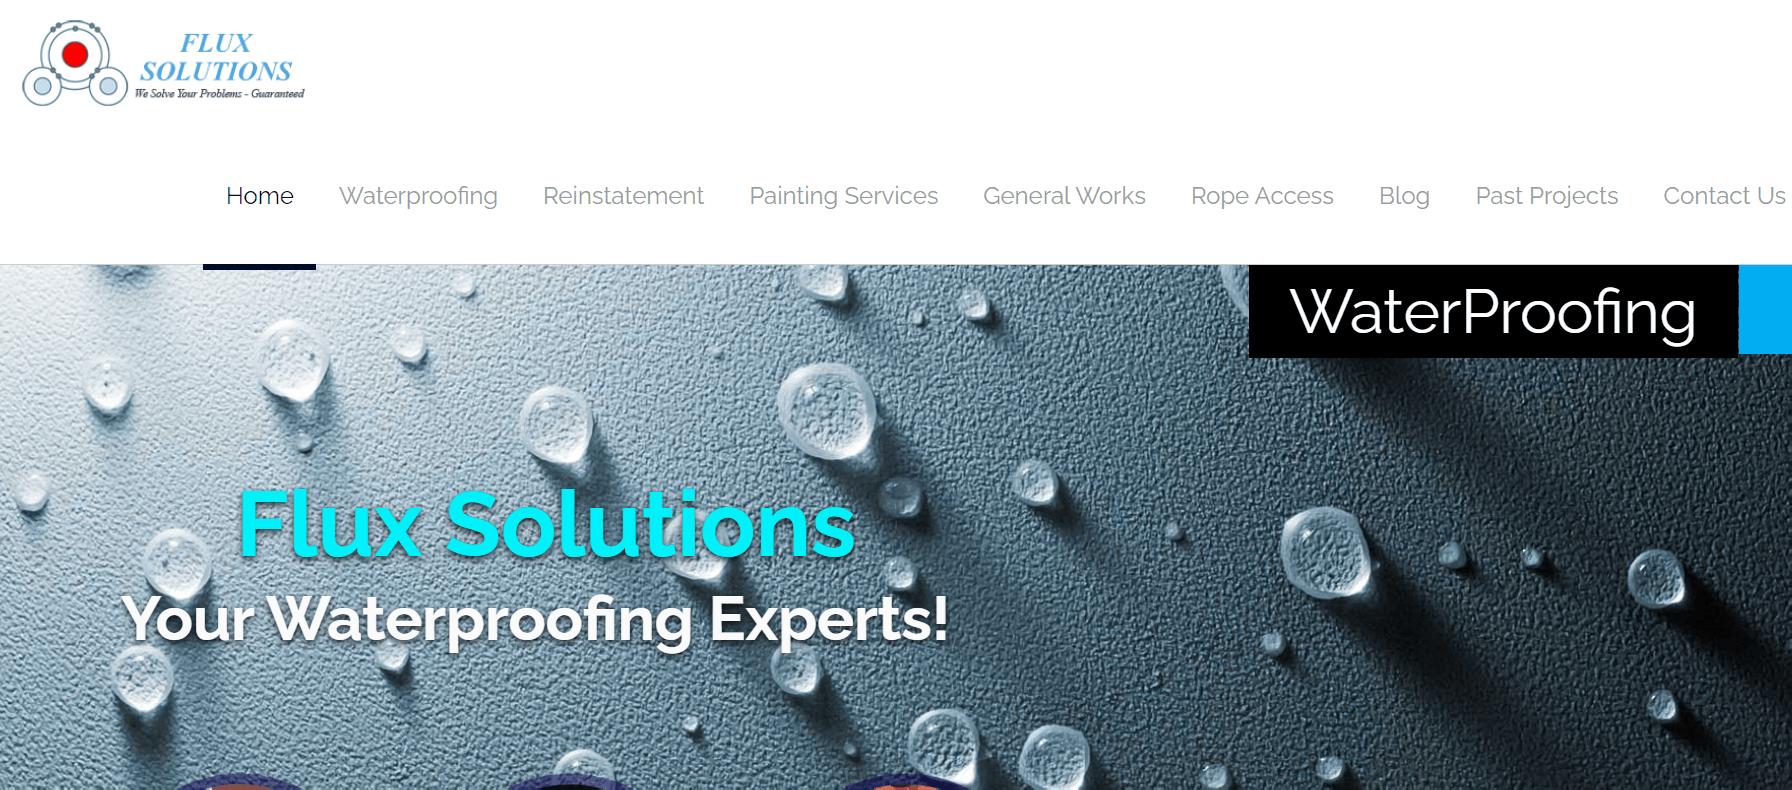 Flux Solutions Pte Ltd is 10 Best Waterproofing experts in Singapore, Waterproofing Company In Singapore With Prices, best Waterproofing Contractor Singapore, Waterproofing Contractor Singapore Specialist,  top and leading specialist waterproofing contractor in Singapore, waterproof for HDB,